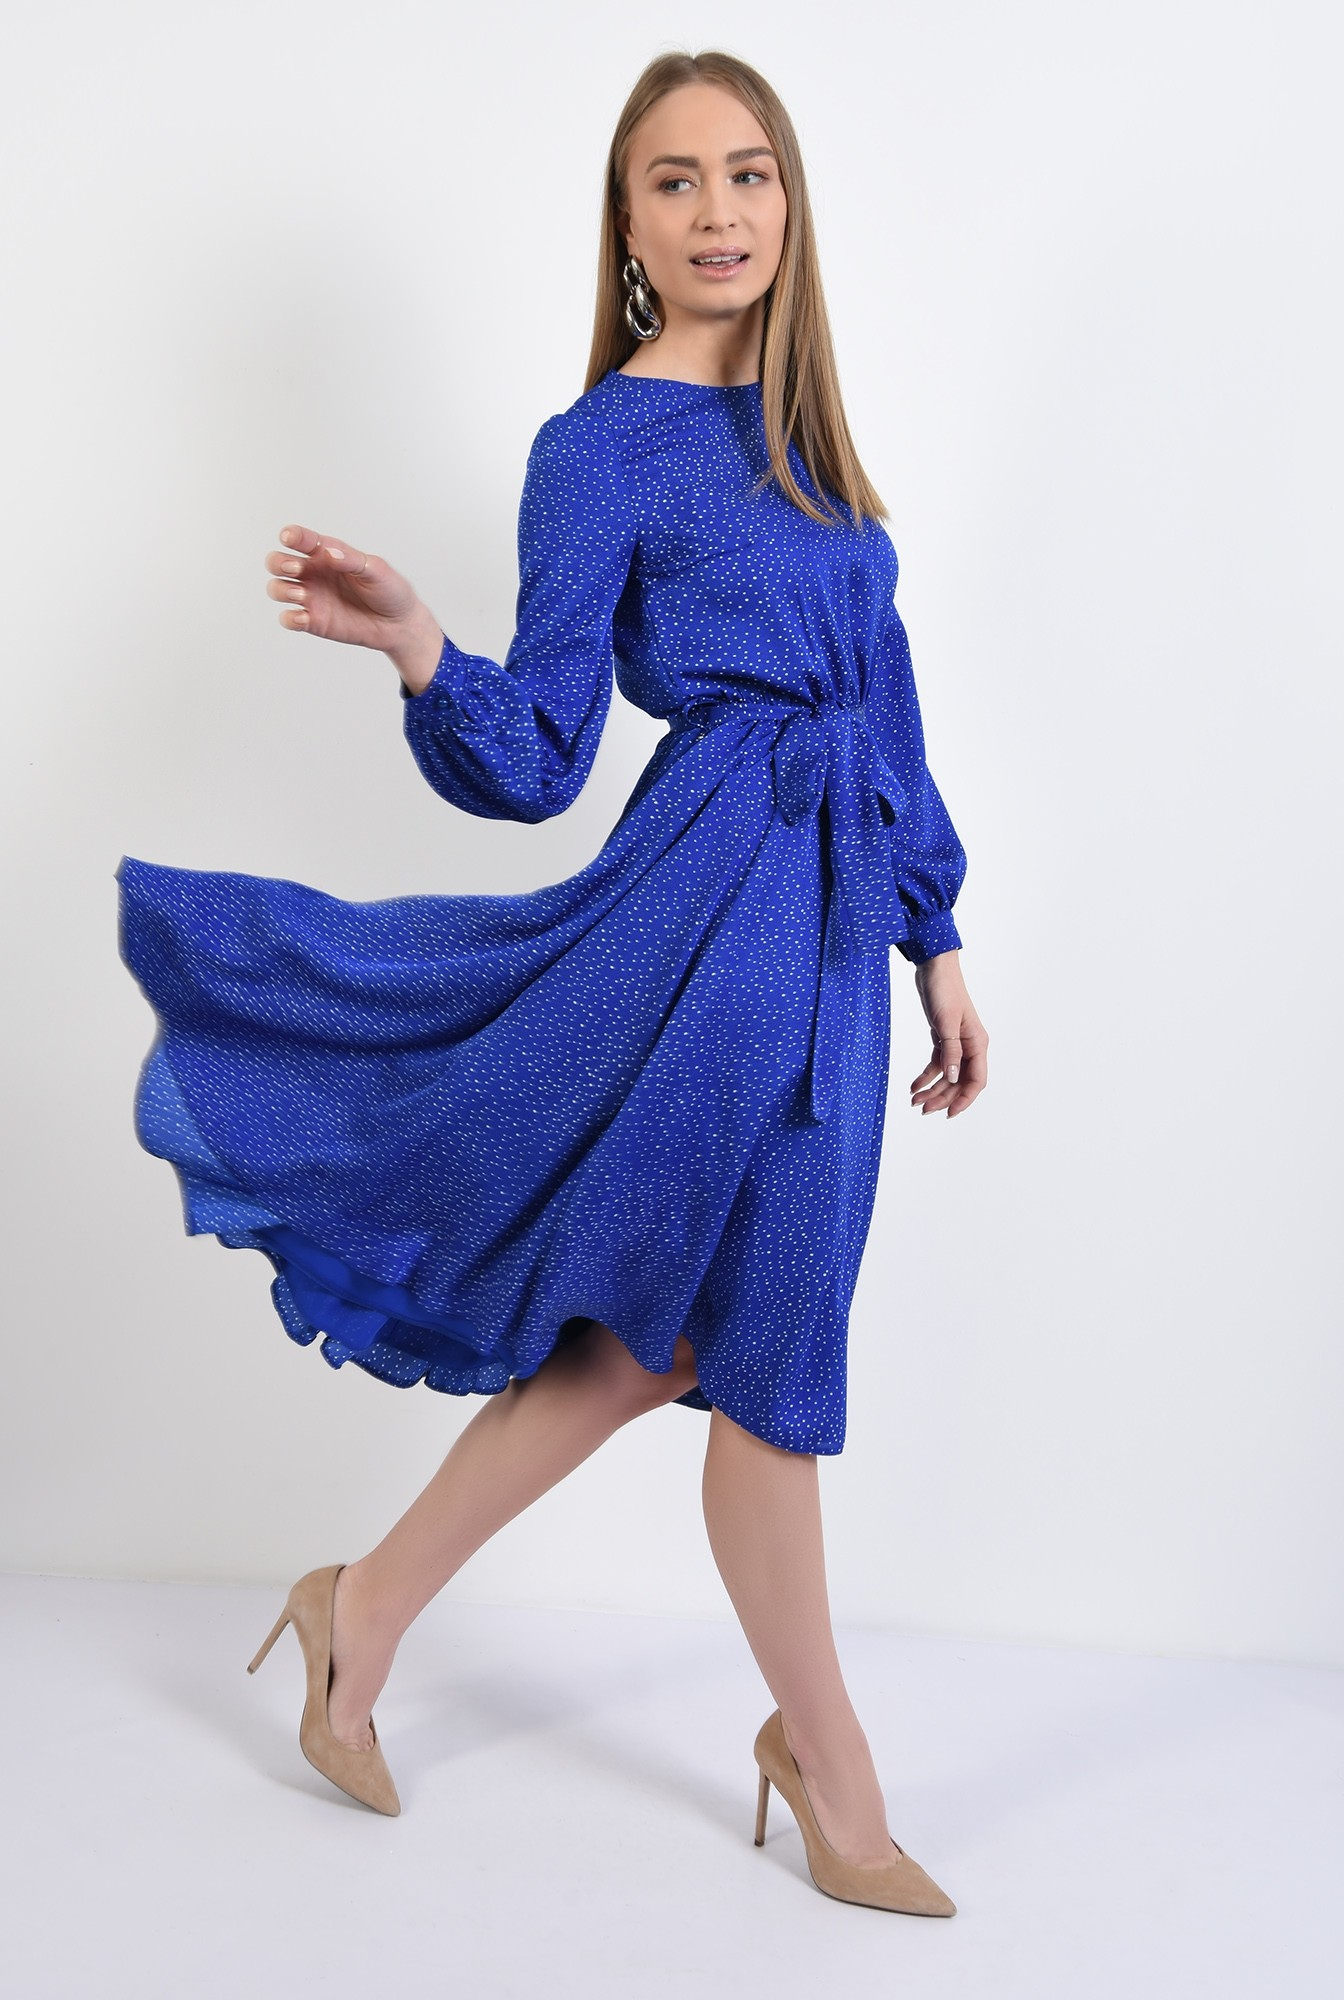 3 - 360 - rochie midi, clos, cu buline, cu nasturi la spate, rochie de primavara